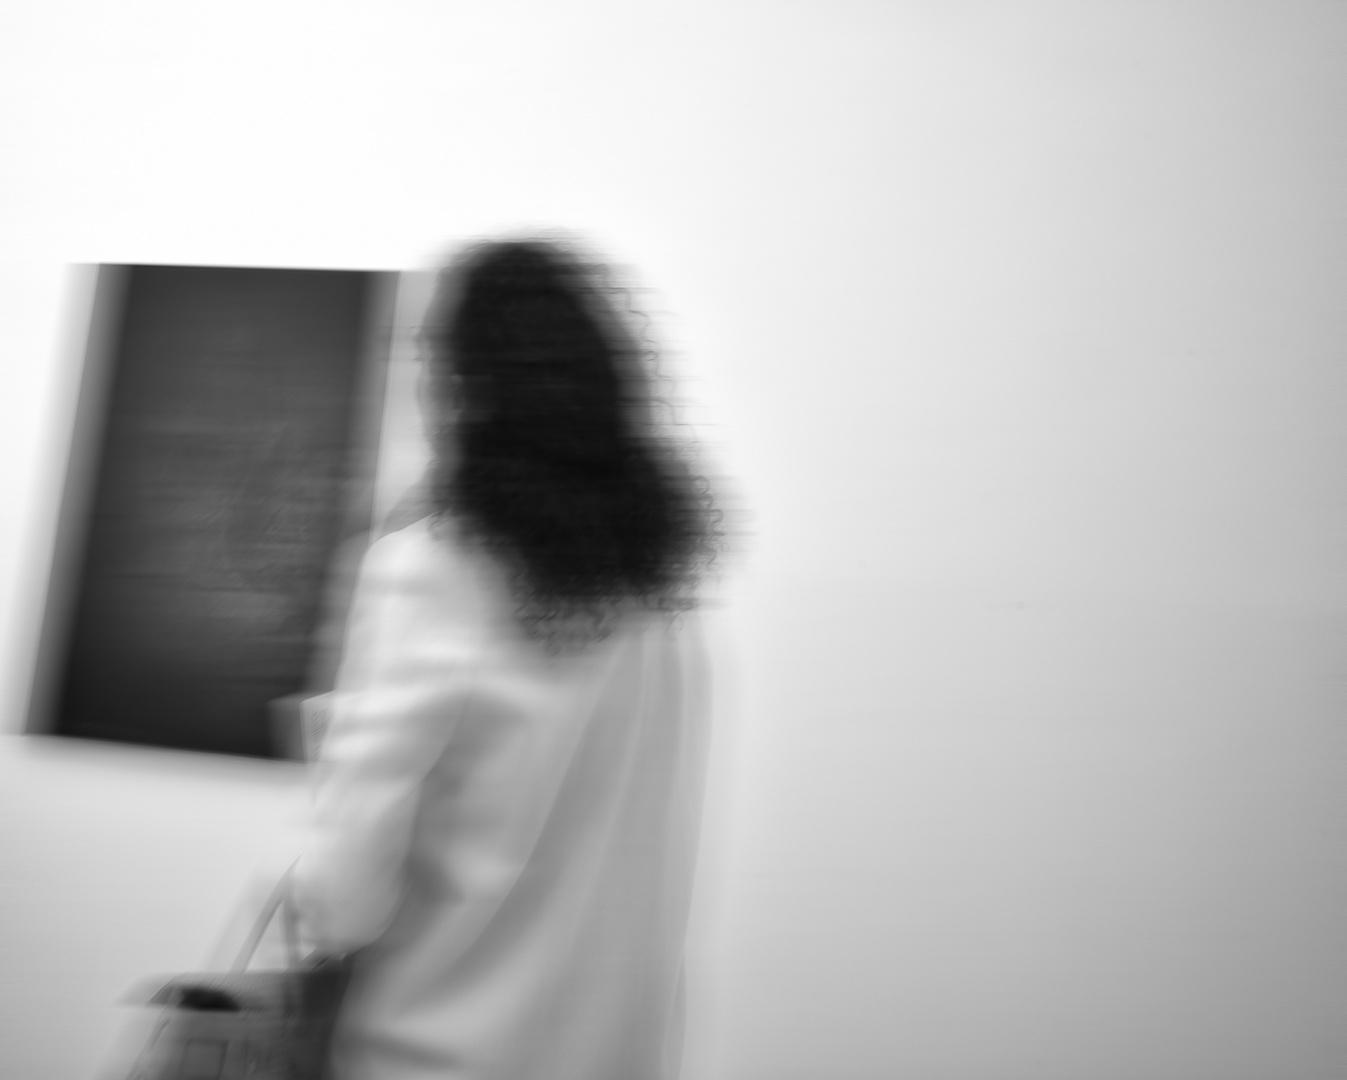 art.encounter - encounter.art